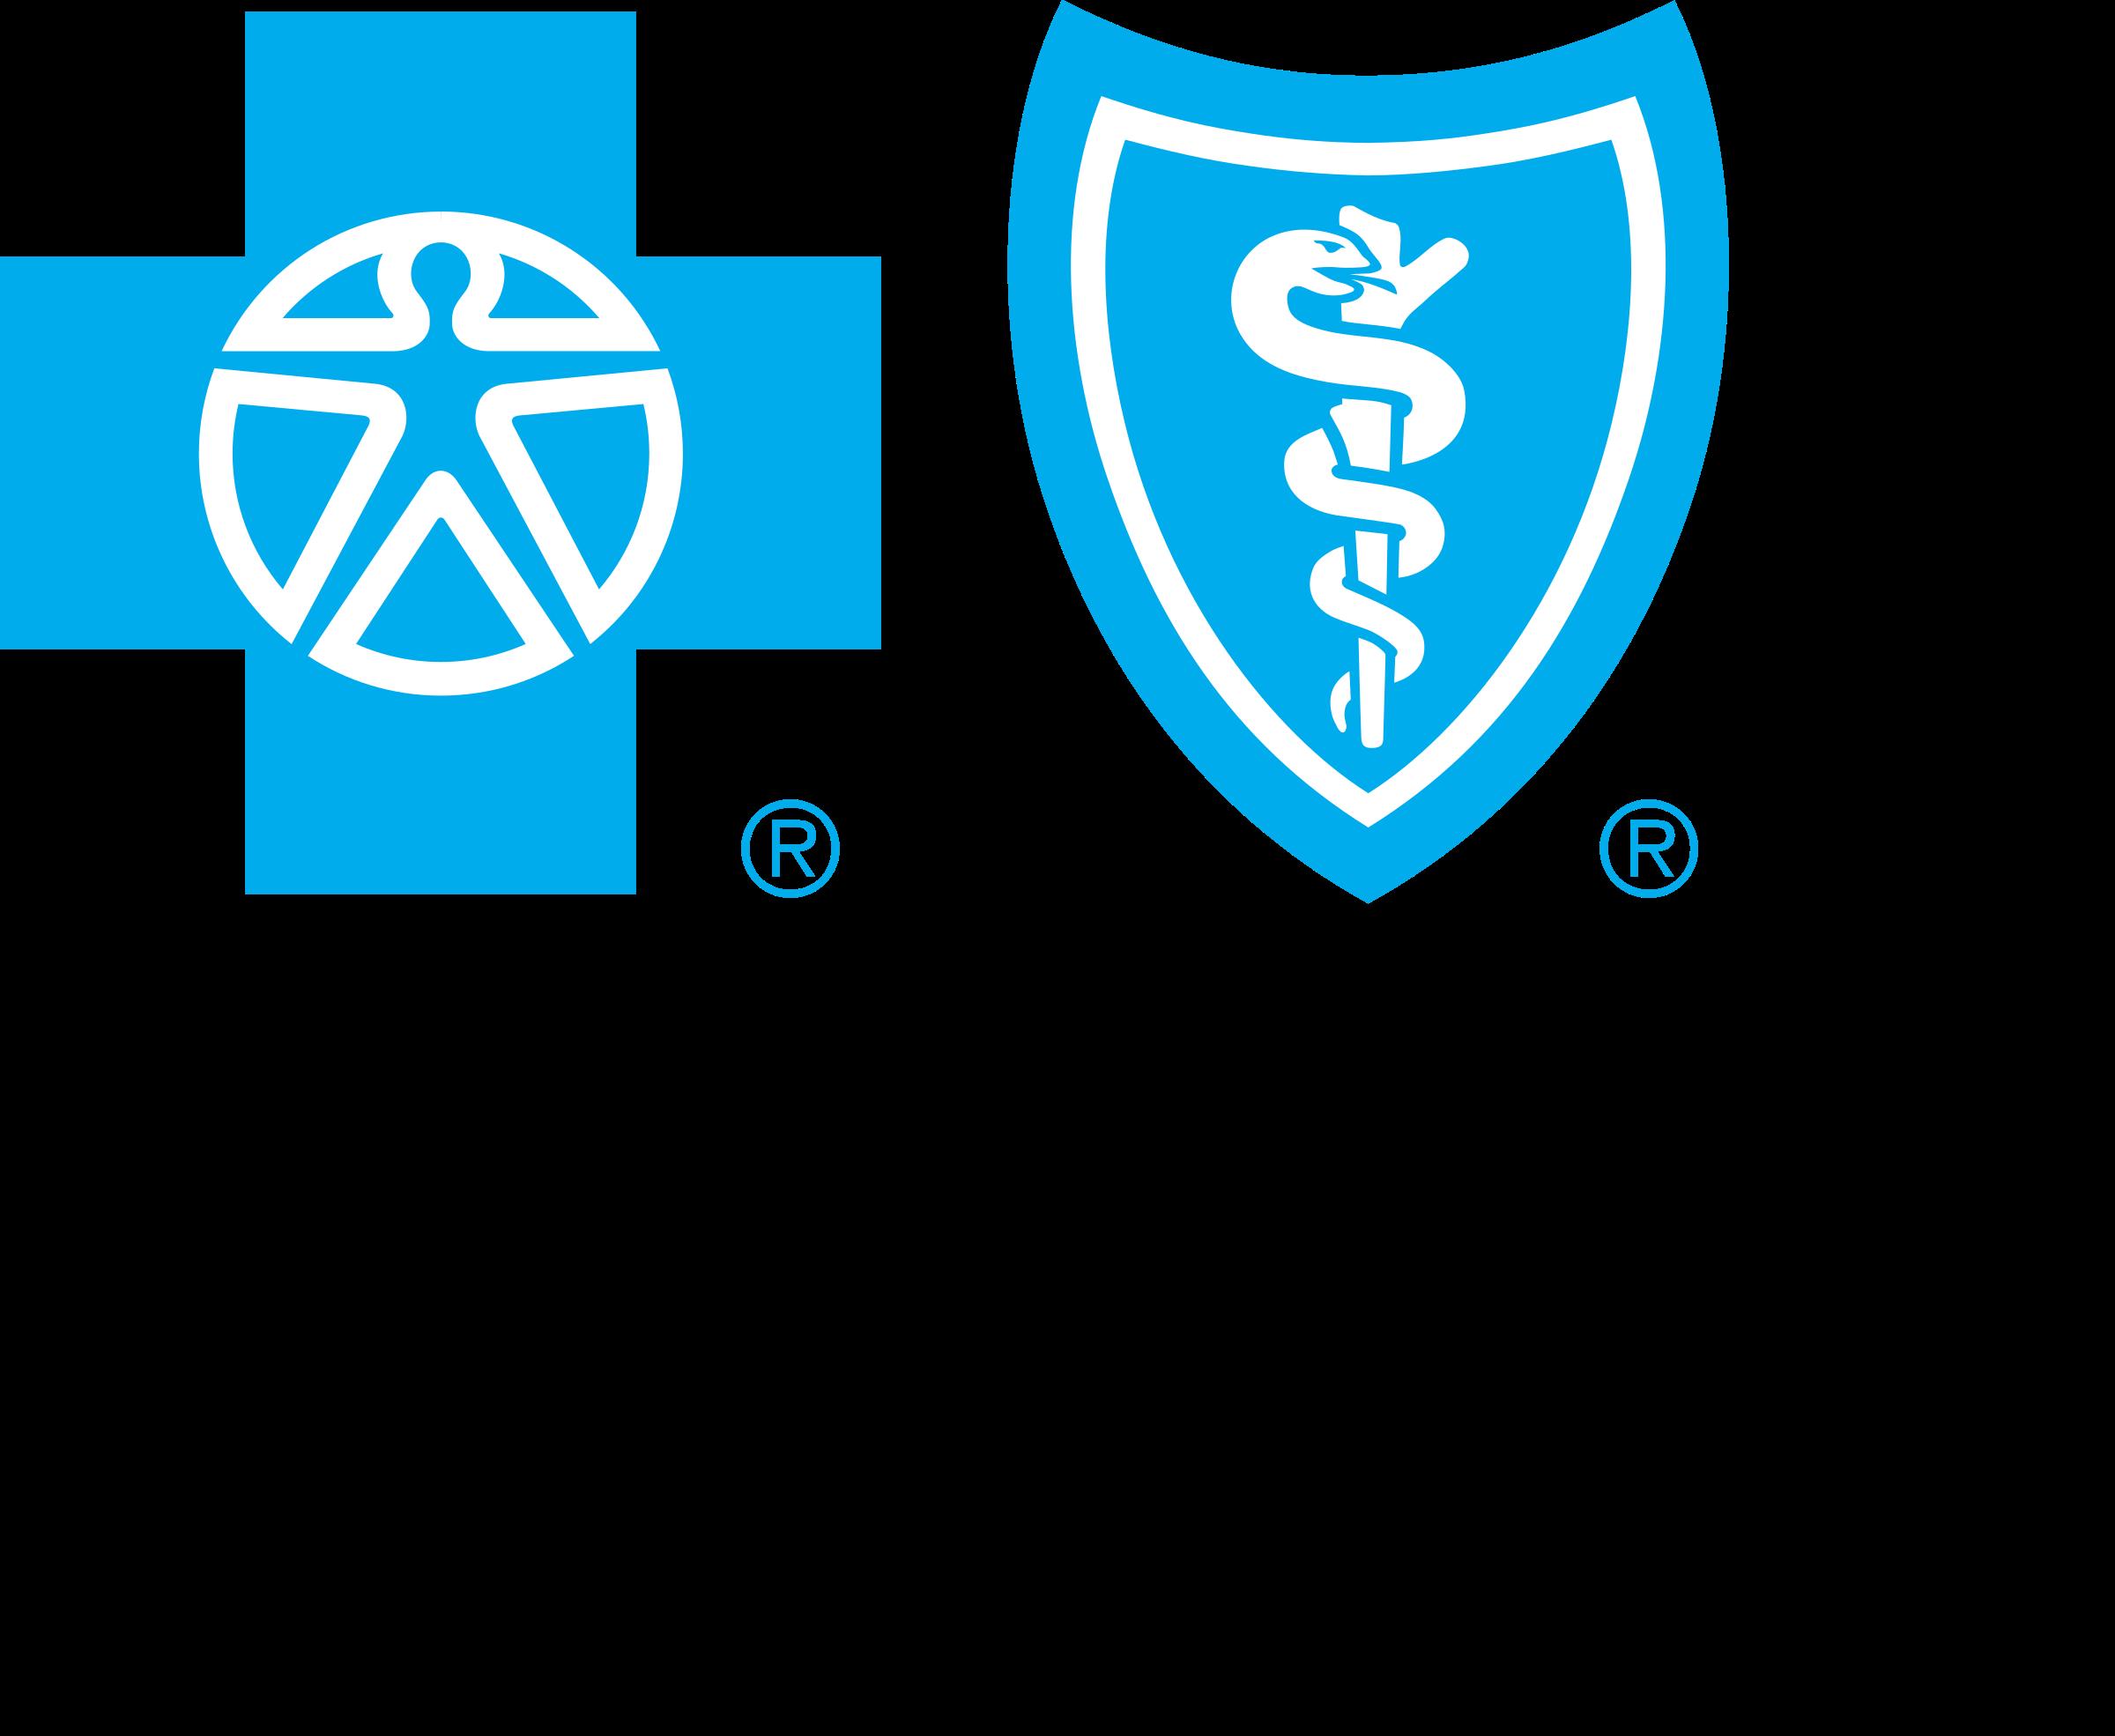 blue-cross-blue-shield-1-logo-png-transparent